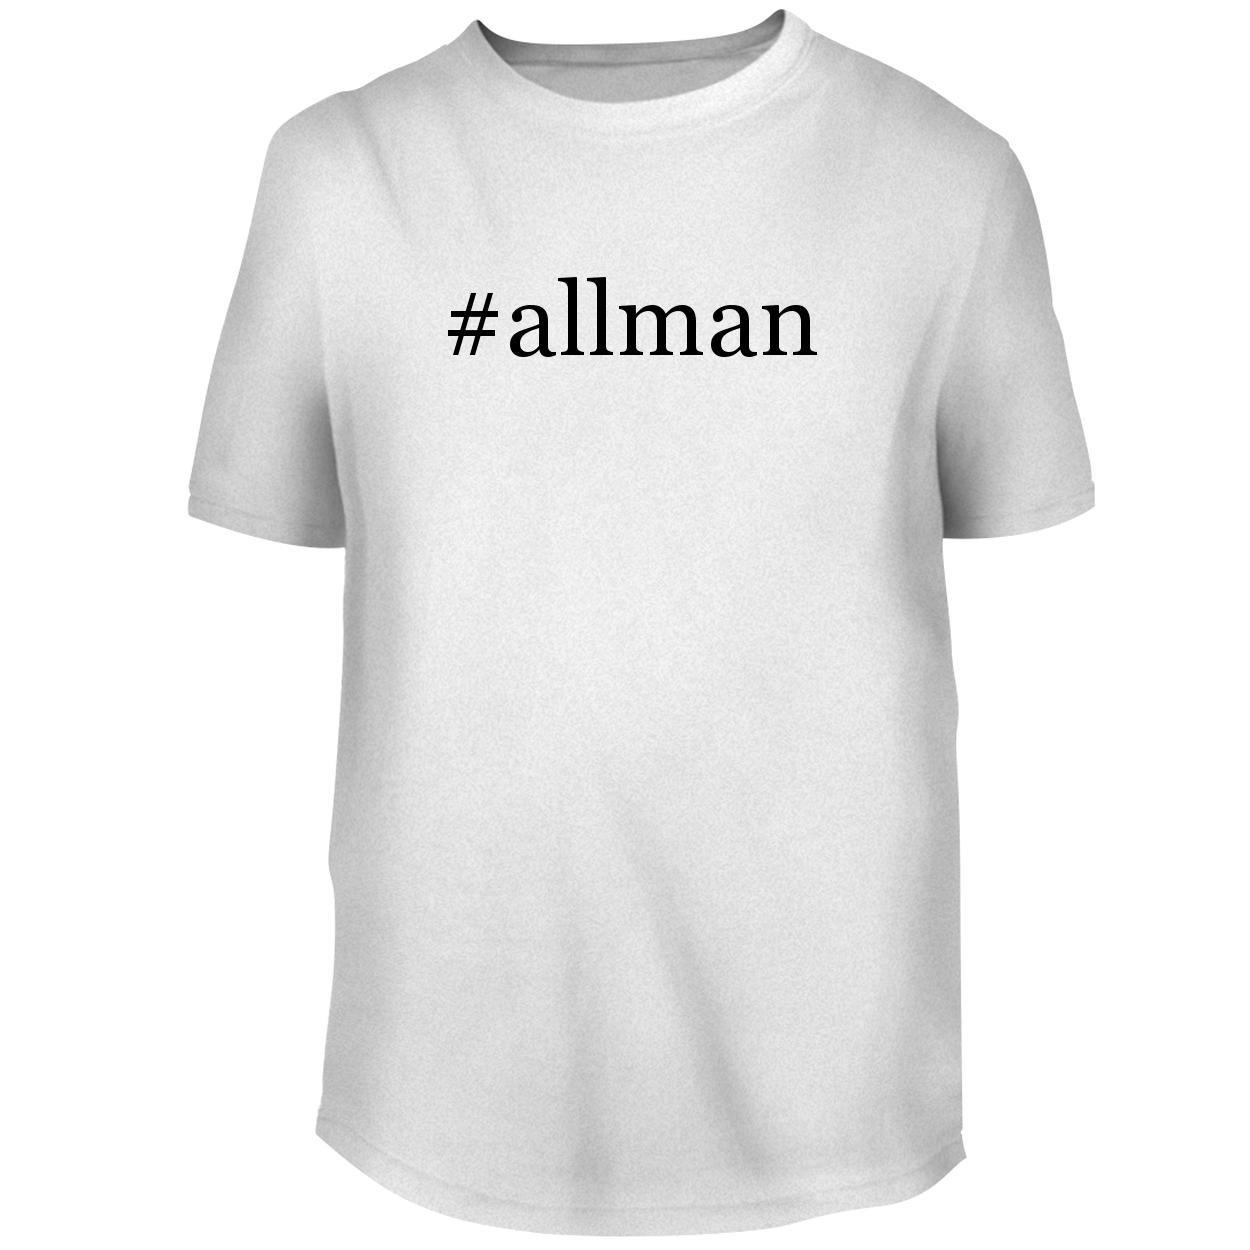 Allman Graphic Tee 3486 Shirts